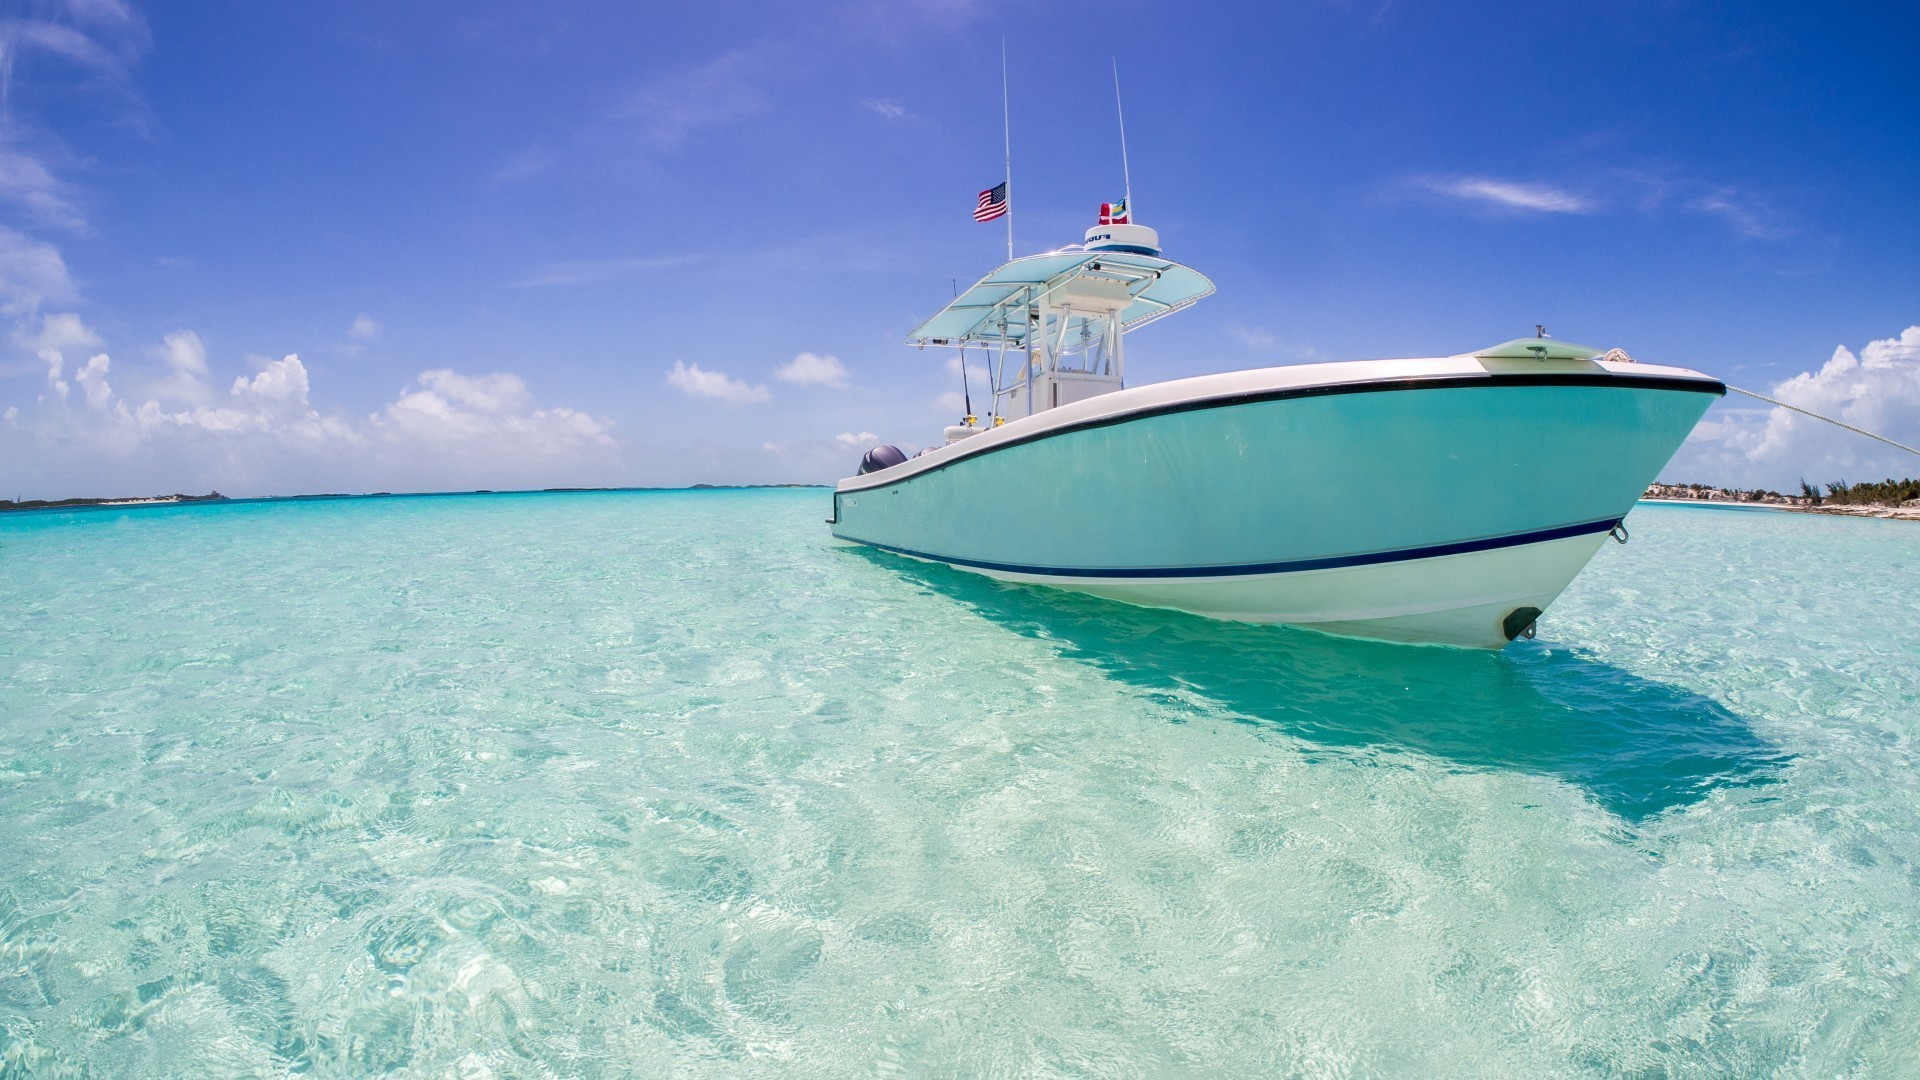 New Providence Island, Bahamas  № 1471759 загрузить